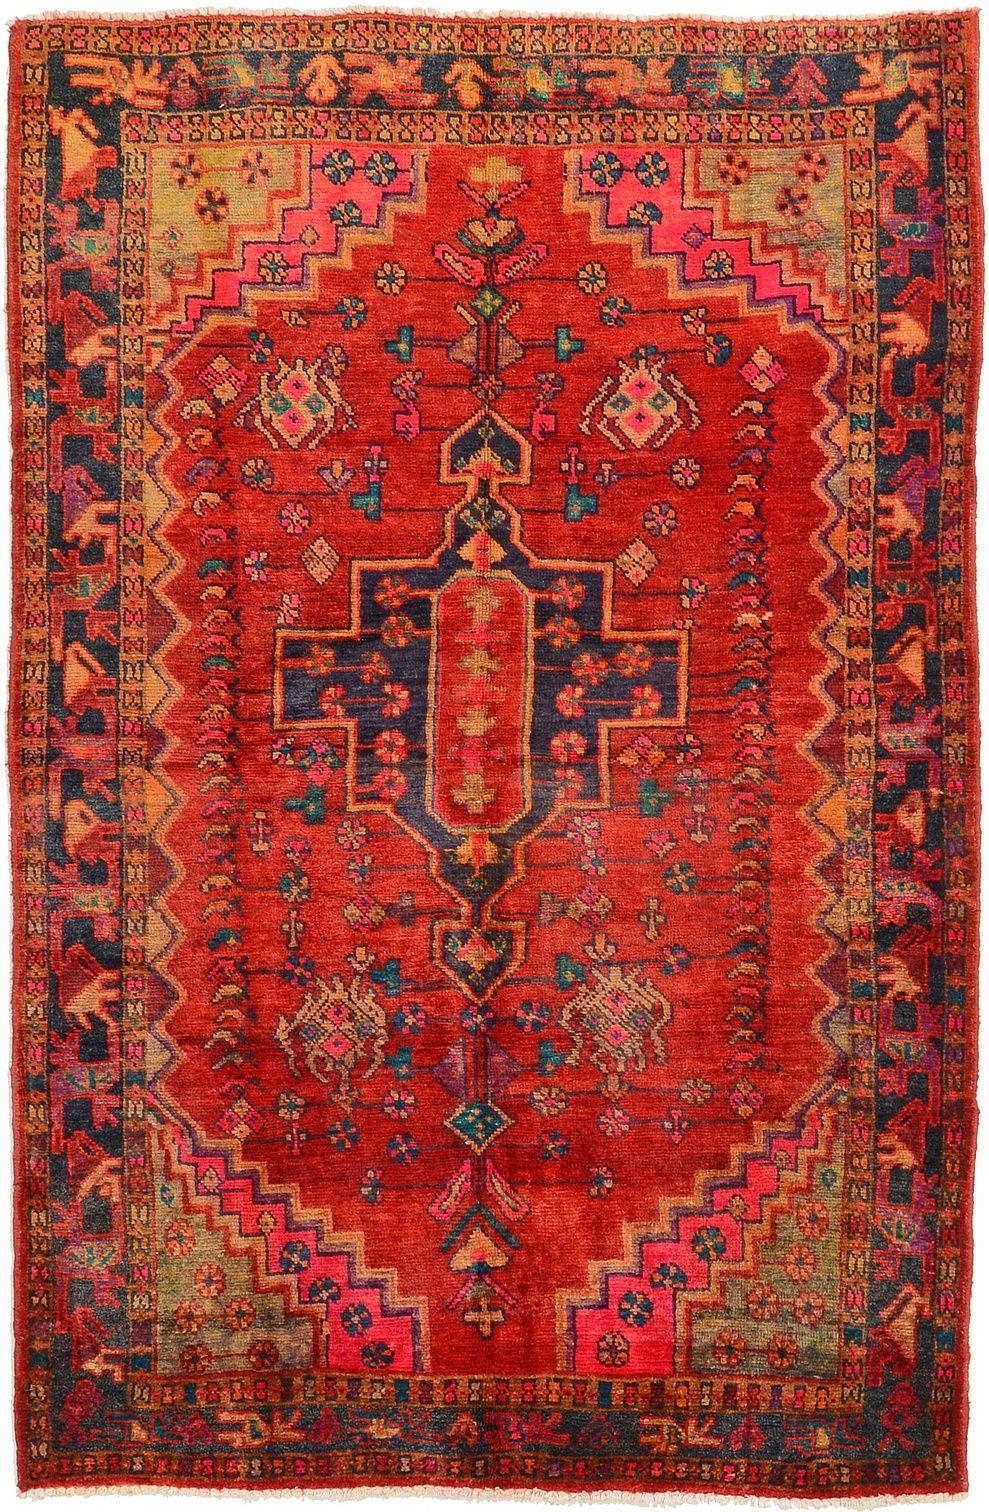 Huge Rug Living Room Ottoman Decor: Red 5' 1 X 7' 9 Hamedan Rug